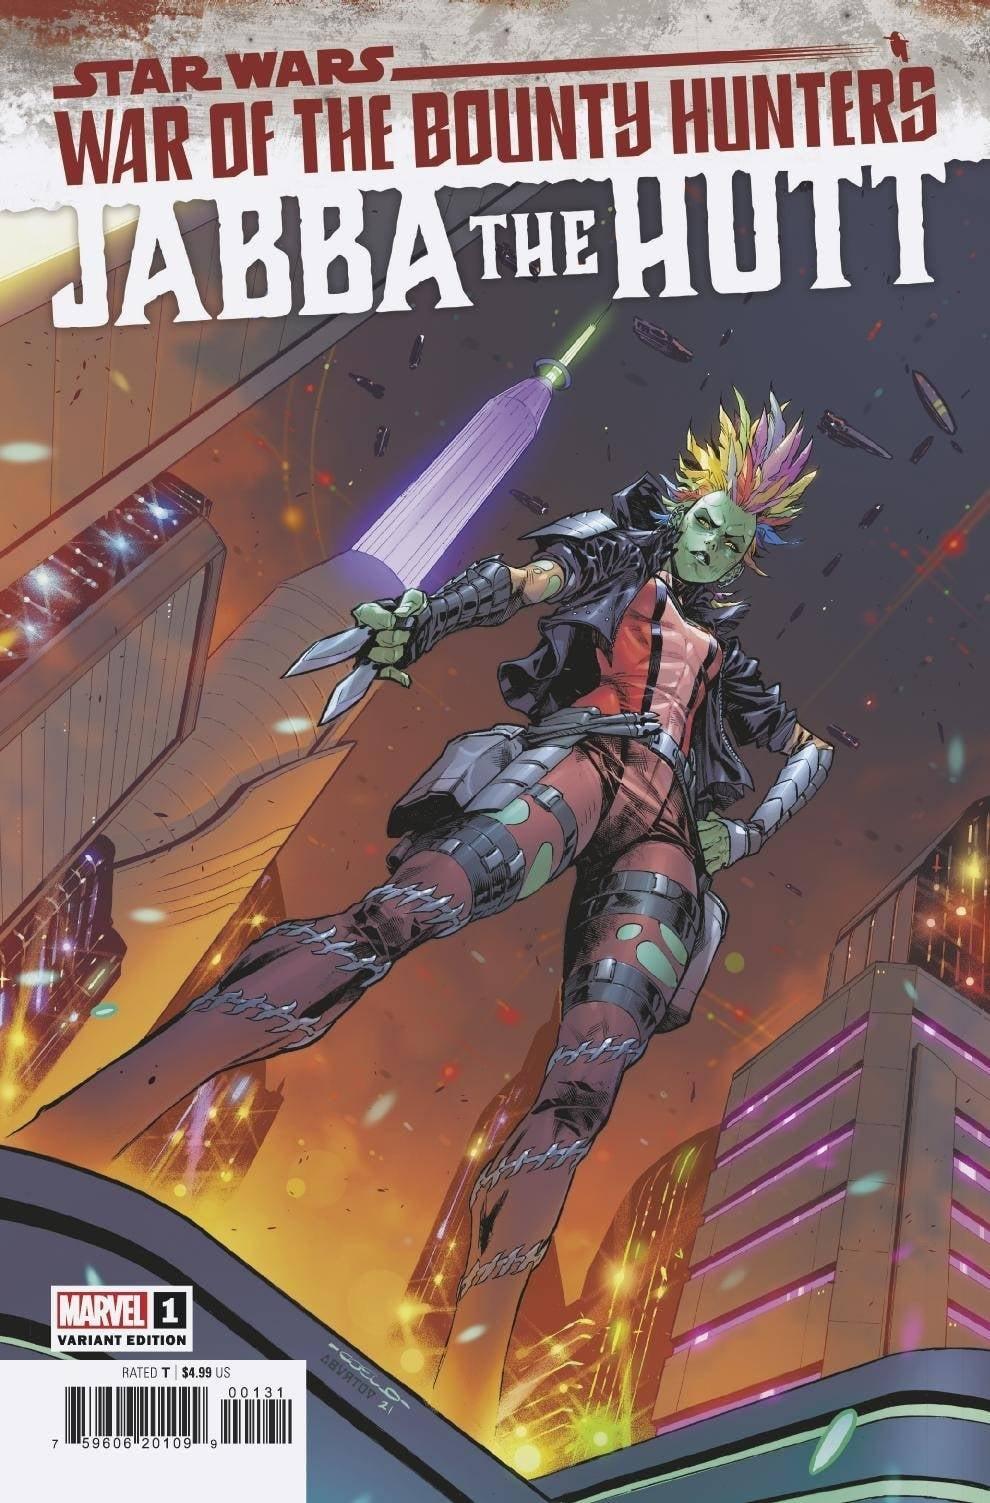 Star Wars War of the Bounty Hunters: Jabba the Hutt - Coello Variant